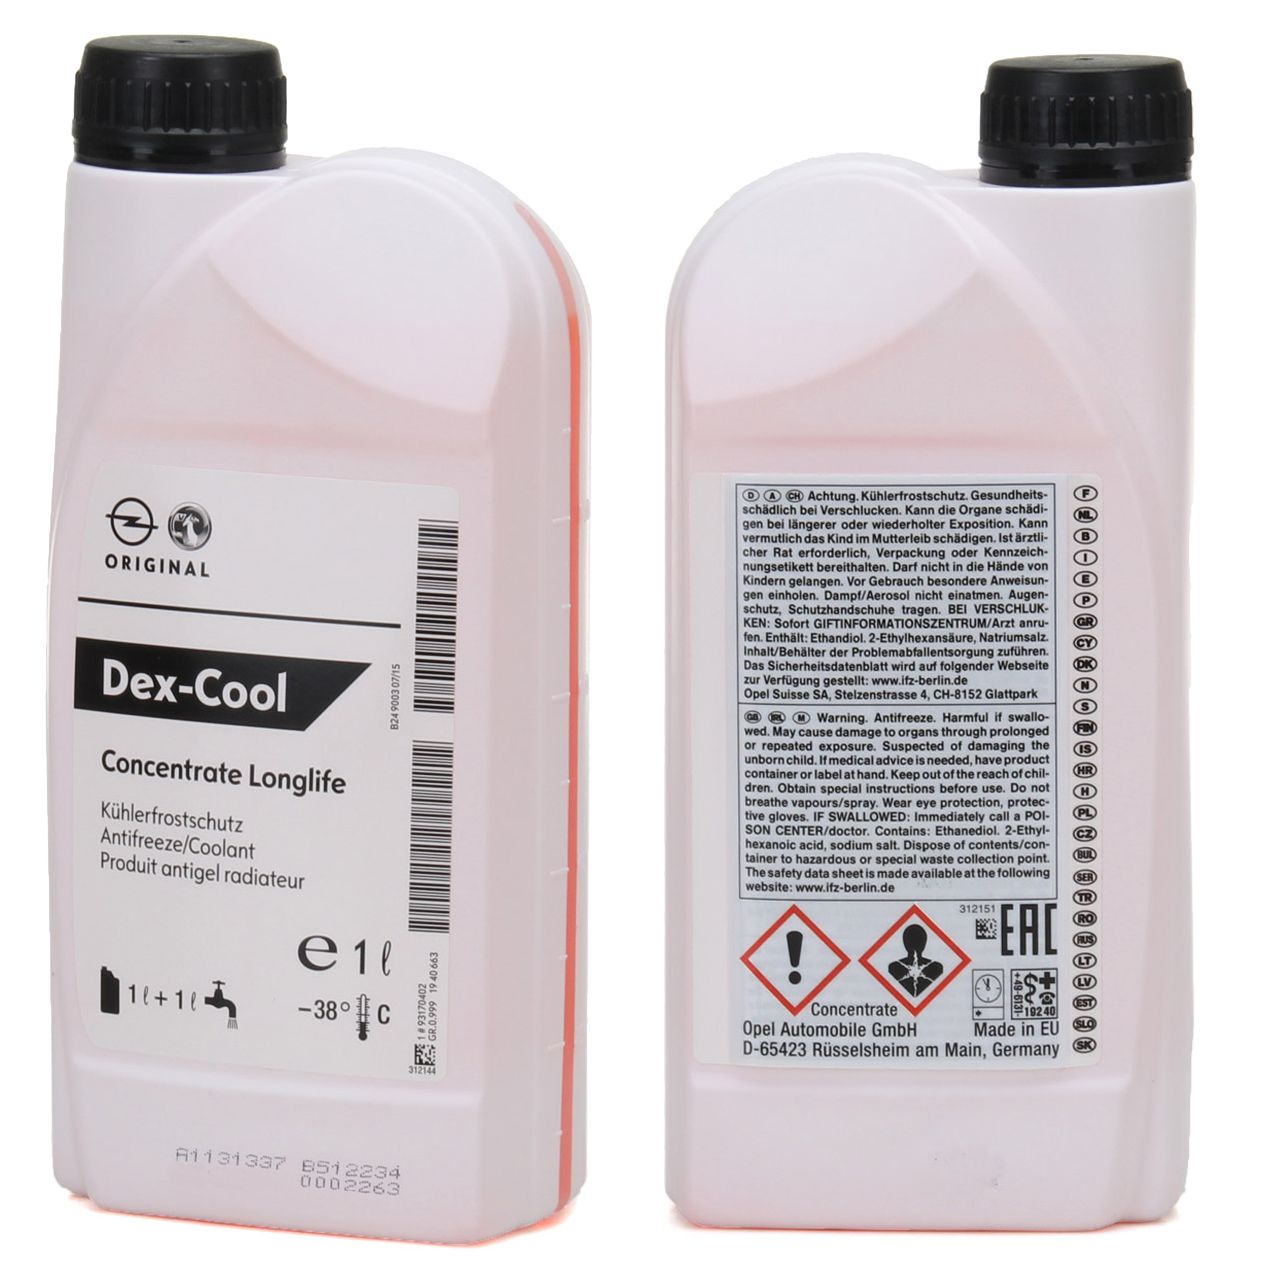 ORIGINAL GM Opel Kühlerfrostschutz Konzentrat LONGLIFE DEX-COOL 2 Liter